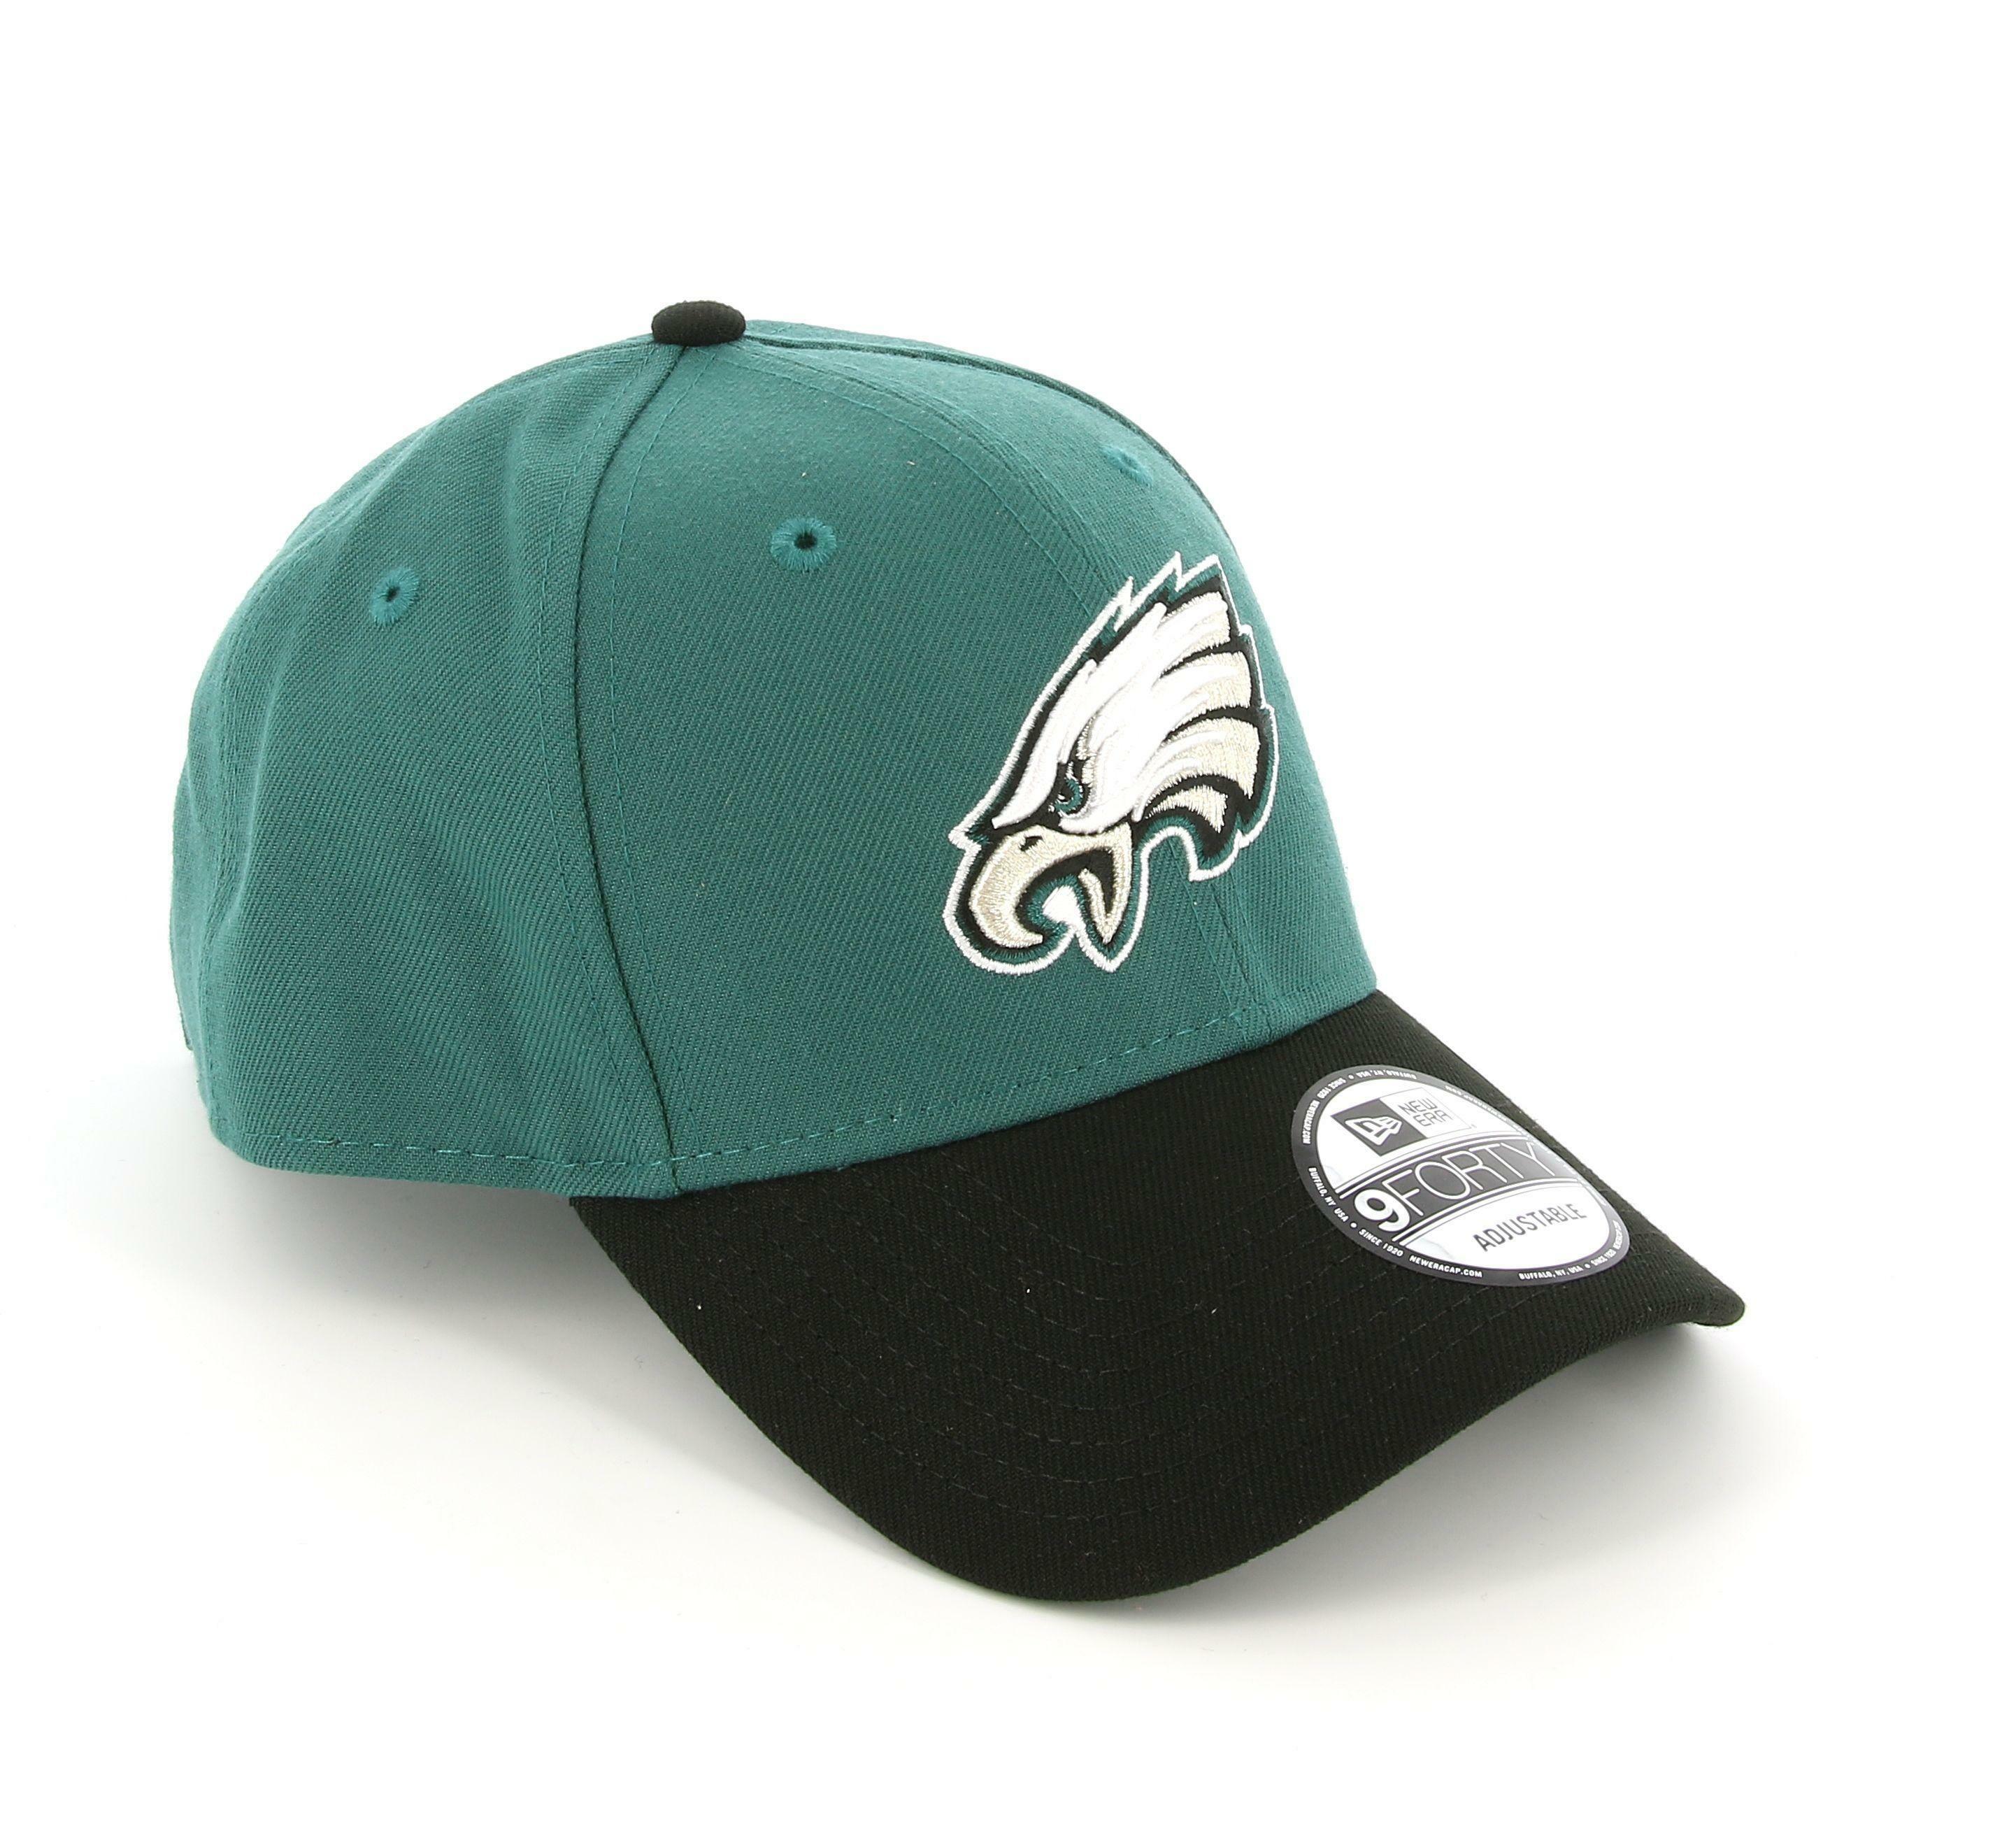 new era new era 10517872 eagles cappello unisex  phieag